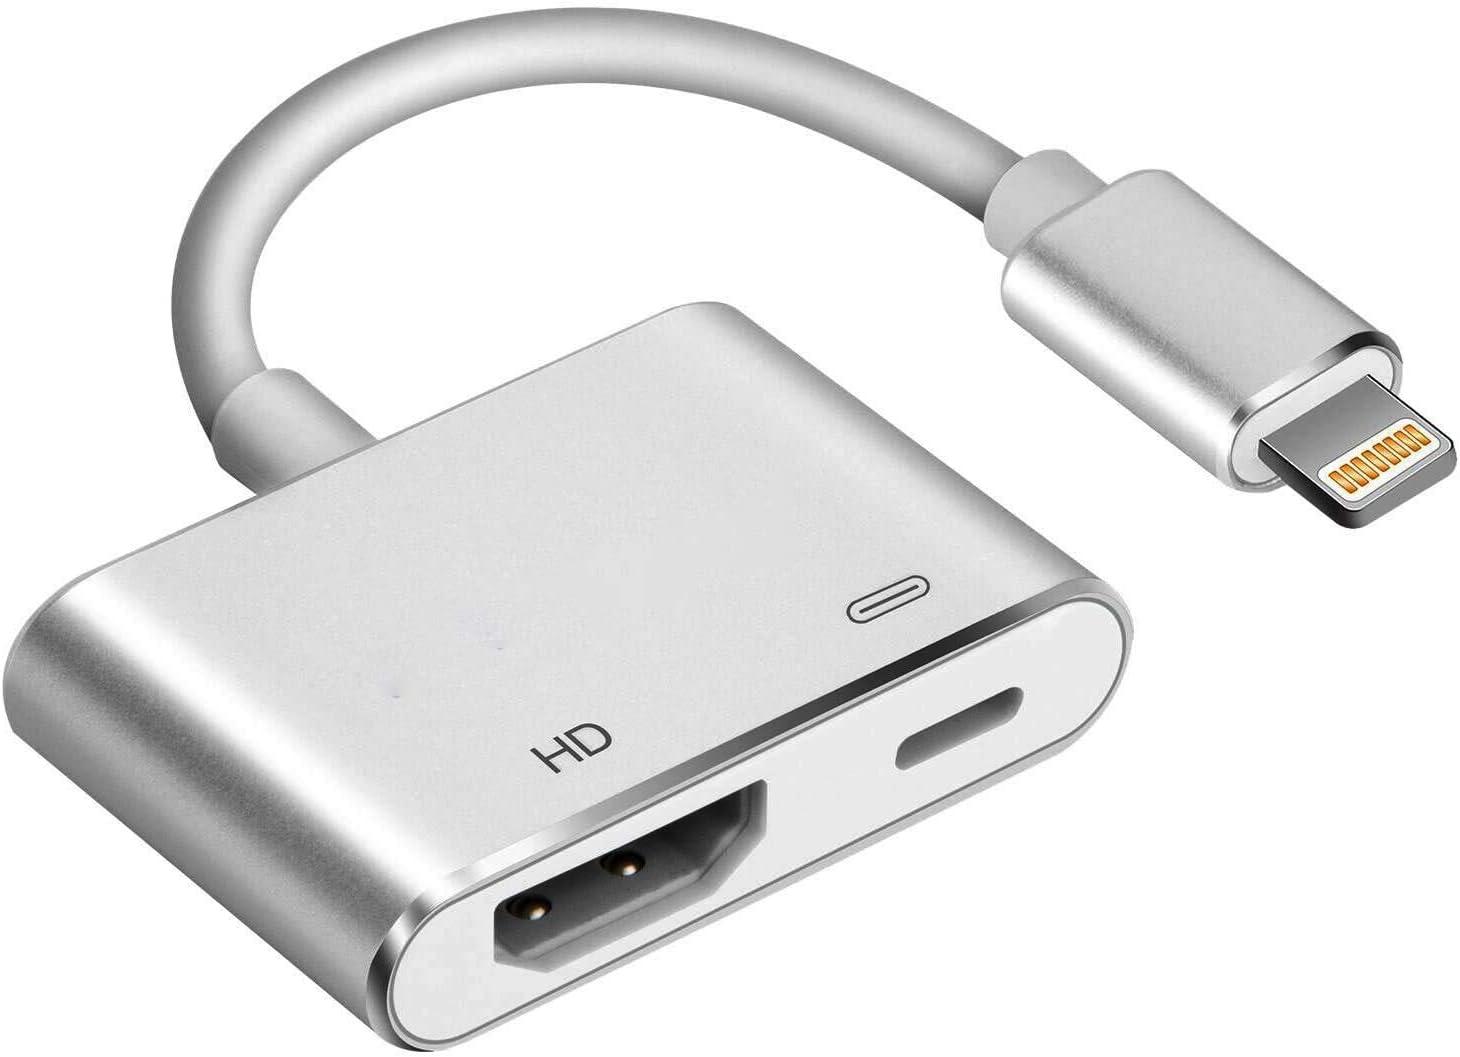 Compatible con iPhone a HDMI Adaptador de Cable, SJ-HYNG Digital AV Adaptador 1080p HD TV Conector para iPhone 11/Pro/Pro MAX/X/XS/XR/8 iPad Pro Air a TV Monitor de proyector (iOS13): Amazon.es: Electrónica